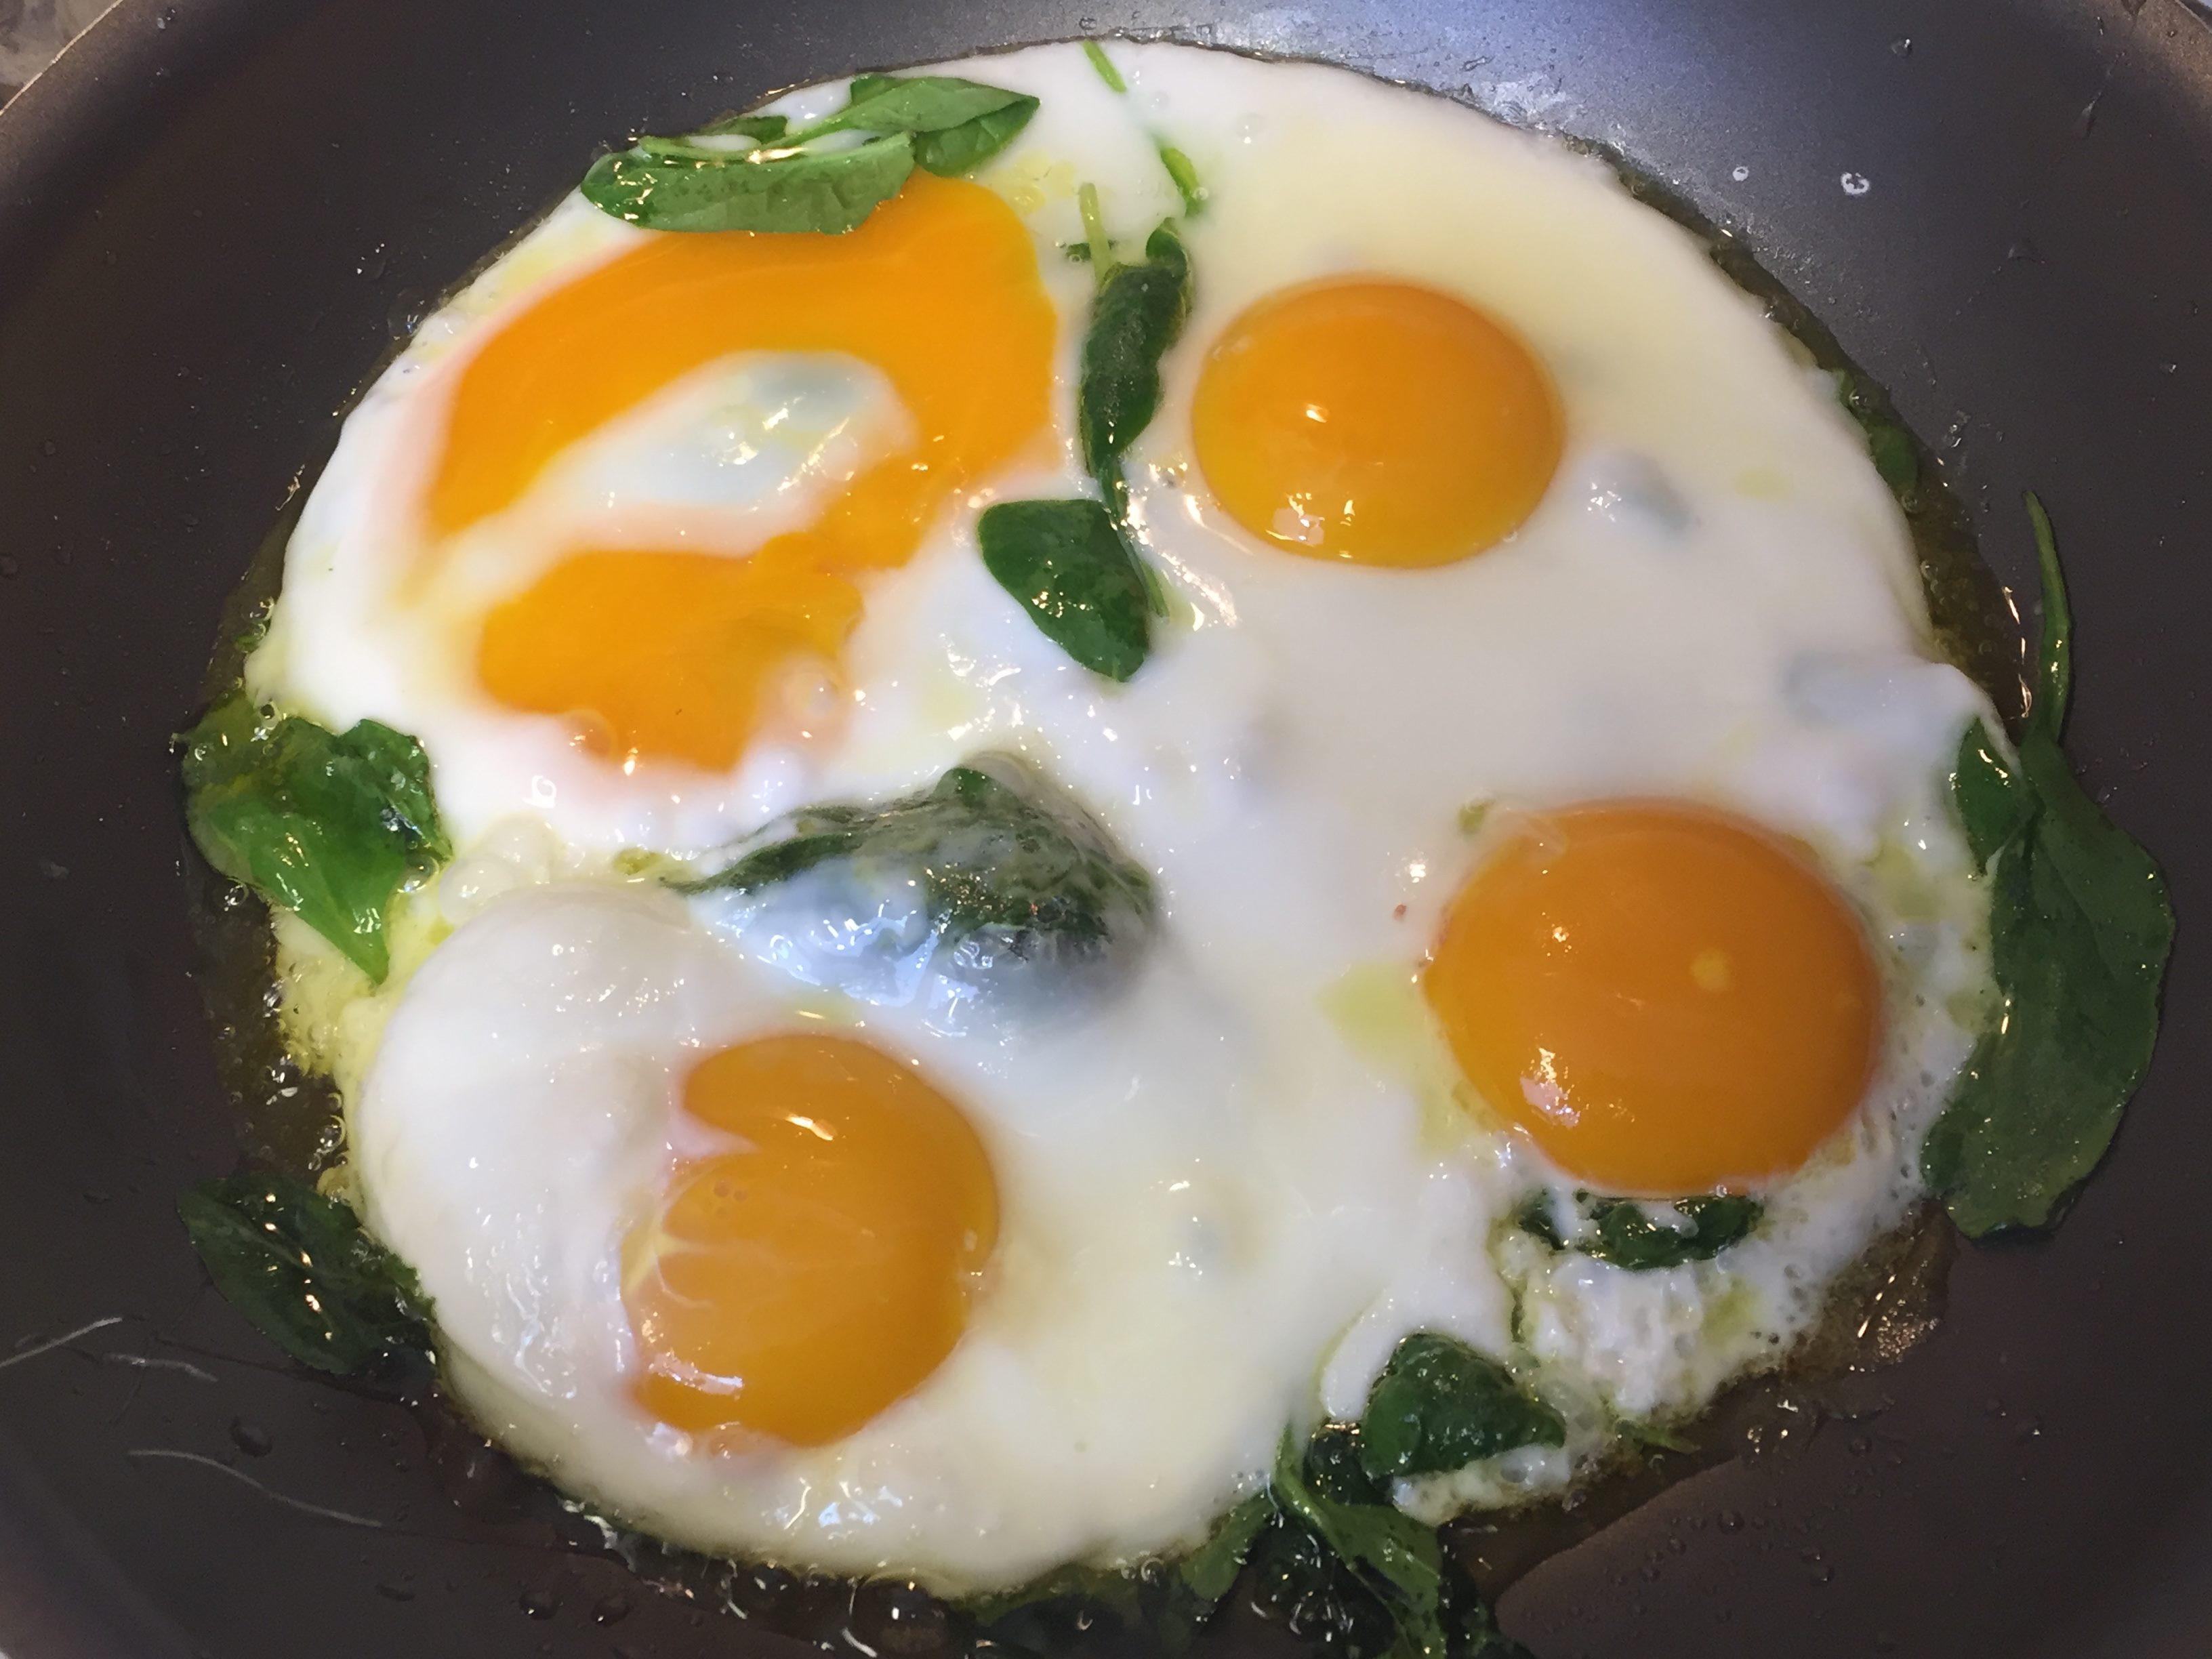 amana-ranch-eggs-in-a-pan-lr.jpg